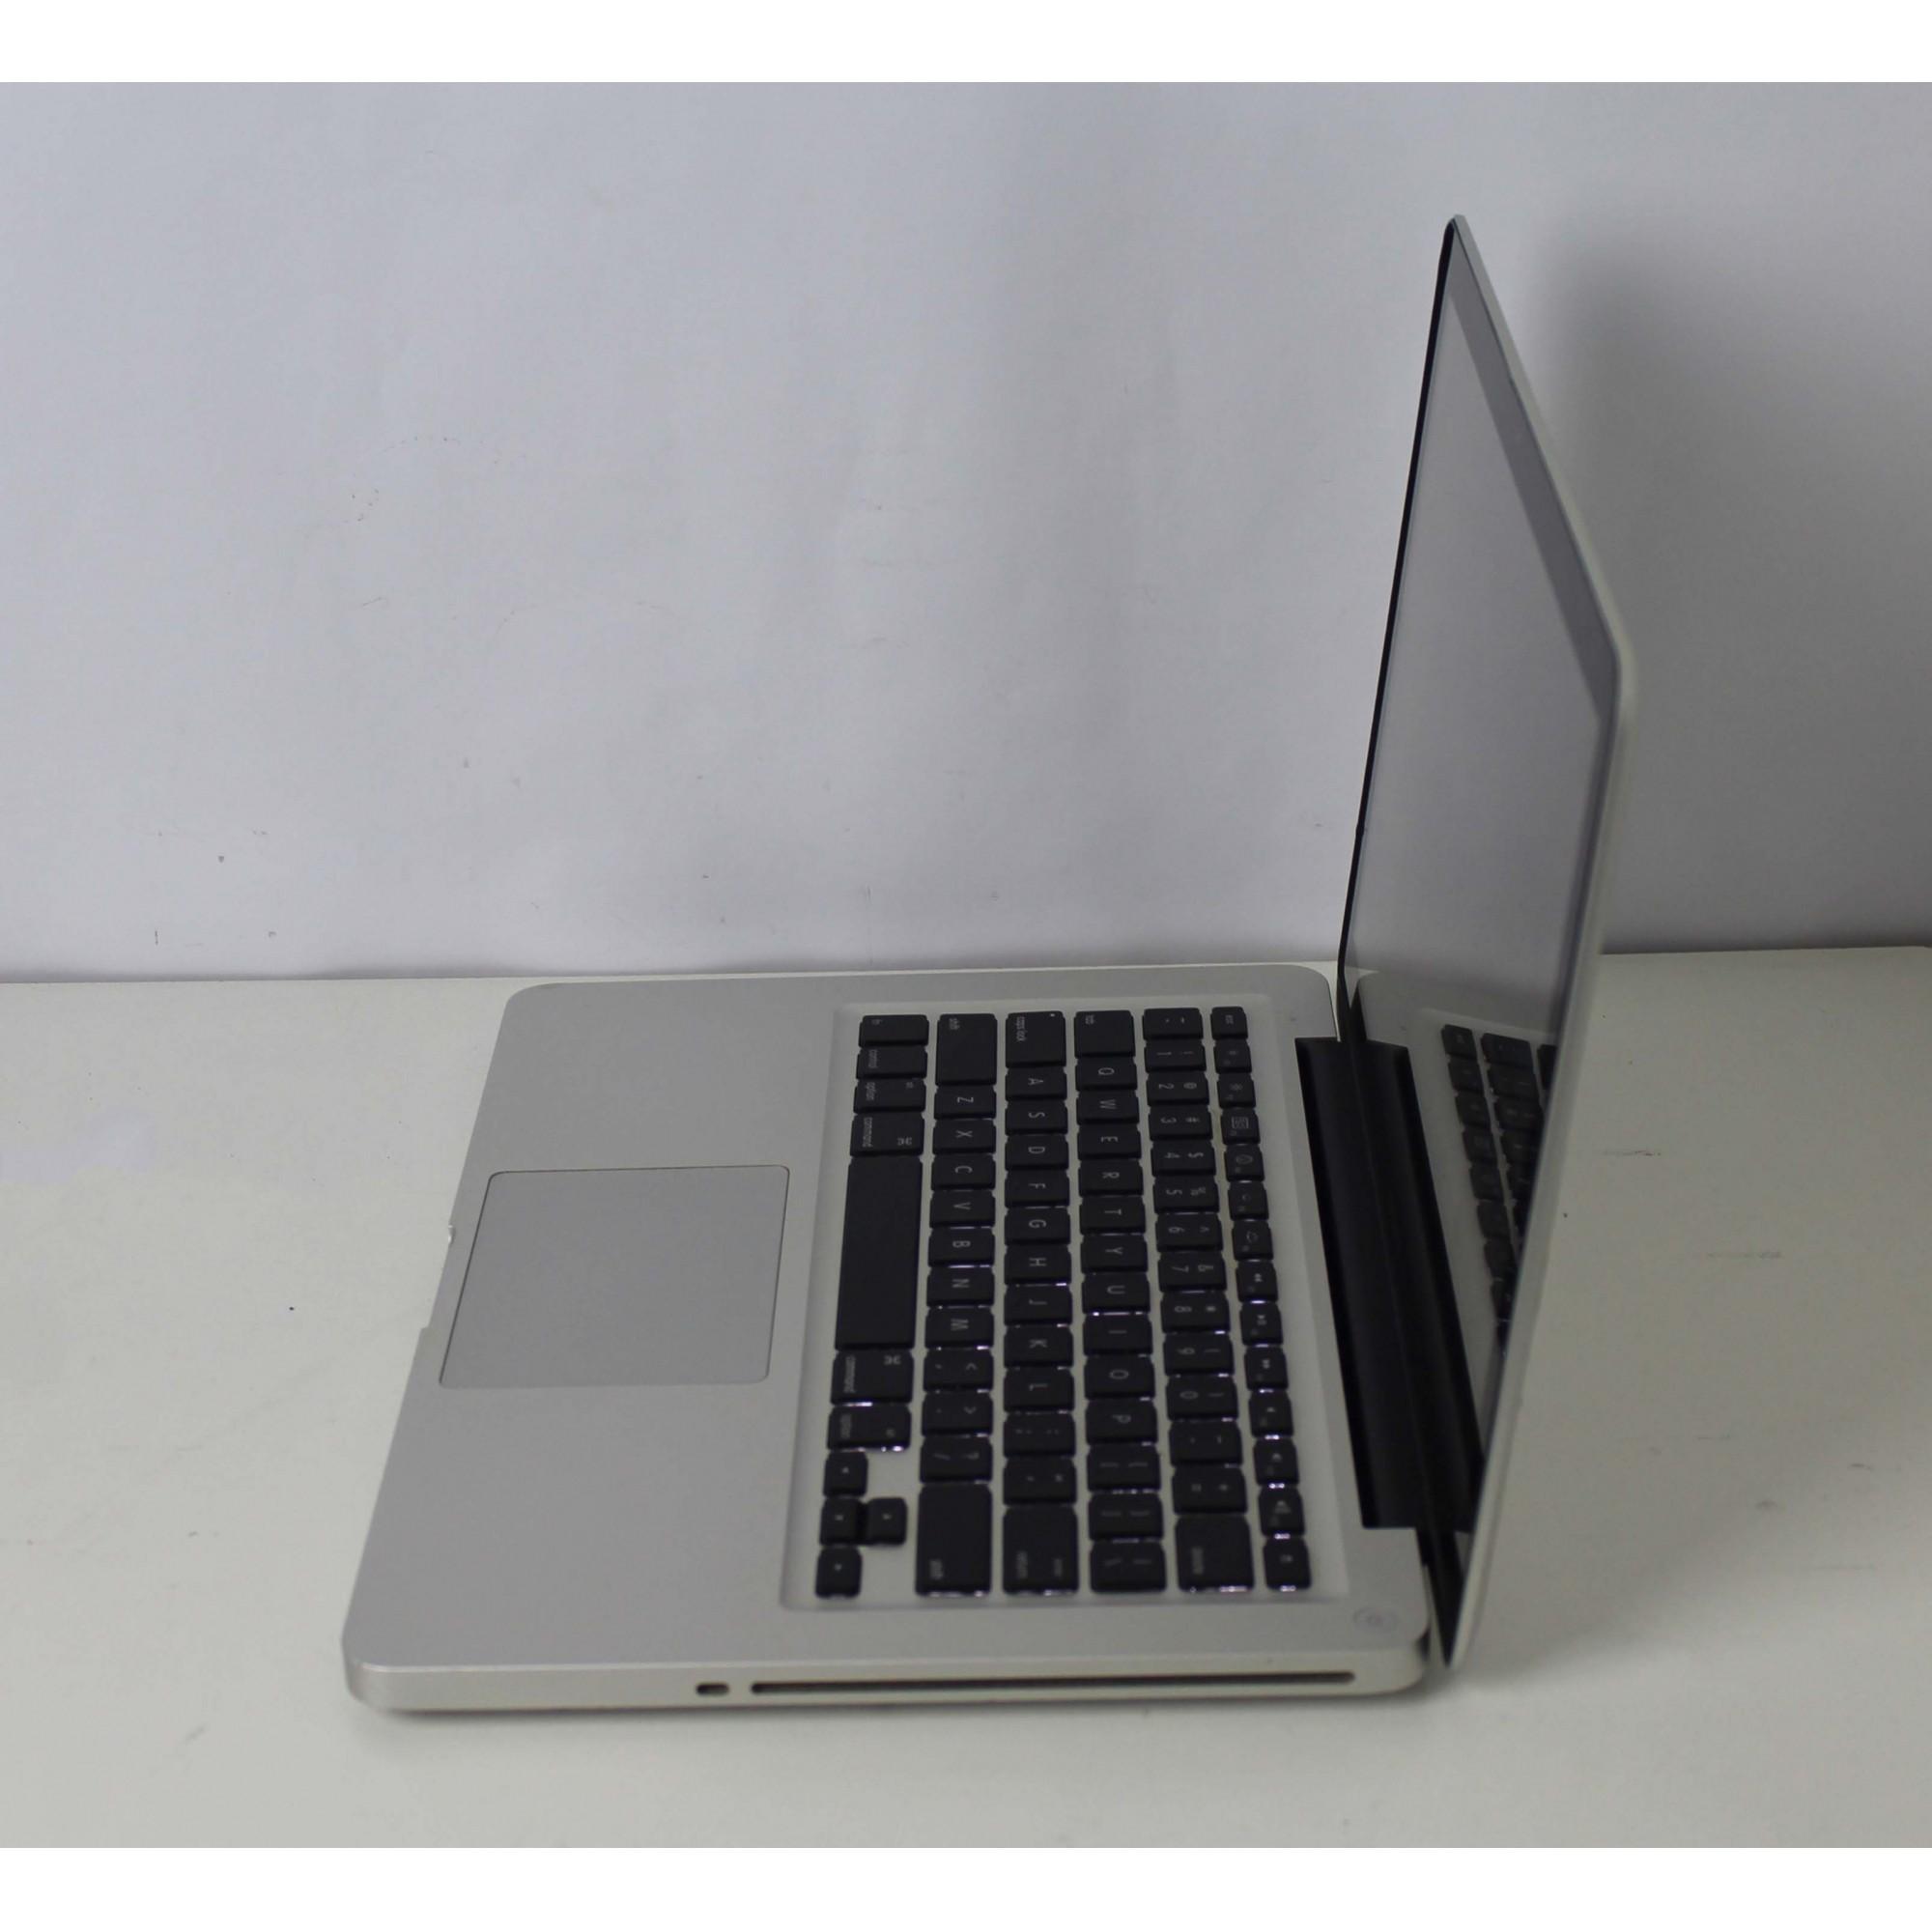 "Macbook Pro MB991LL/A 13.3"" Intel Core 2 Duo 2.53GHz 8GB HD-250GB"